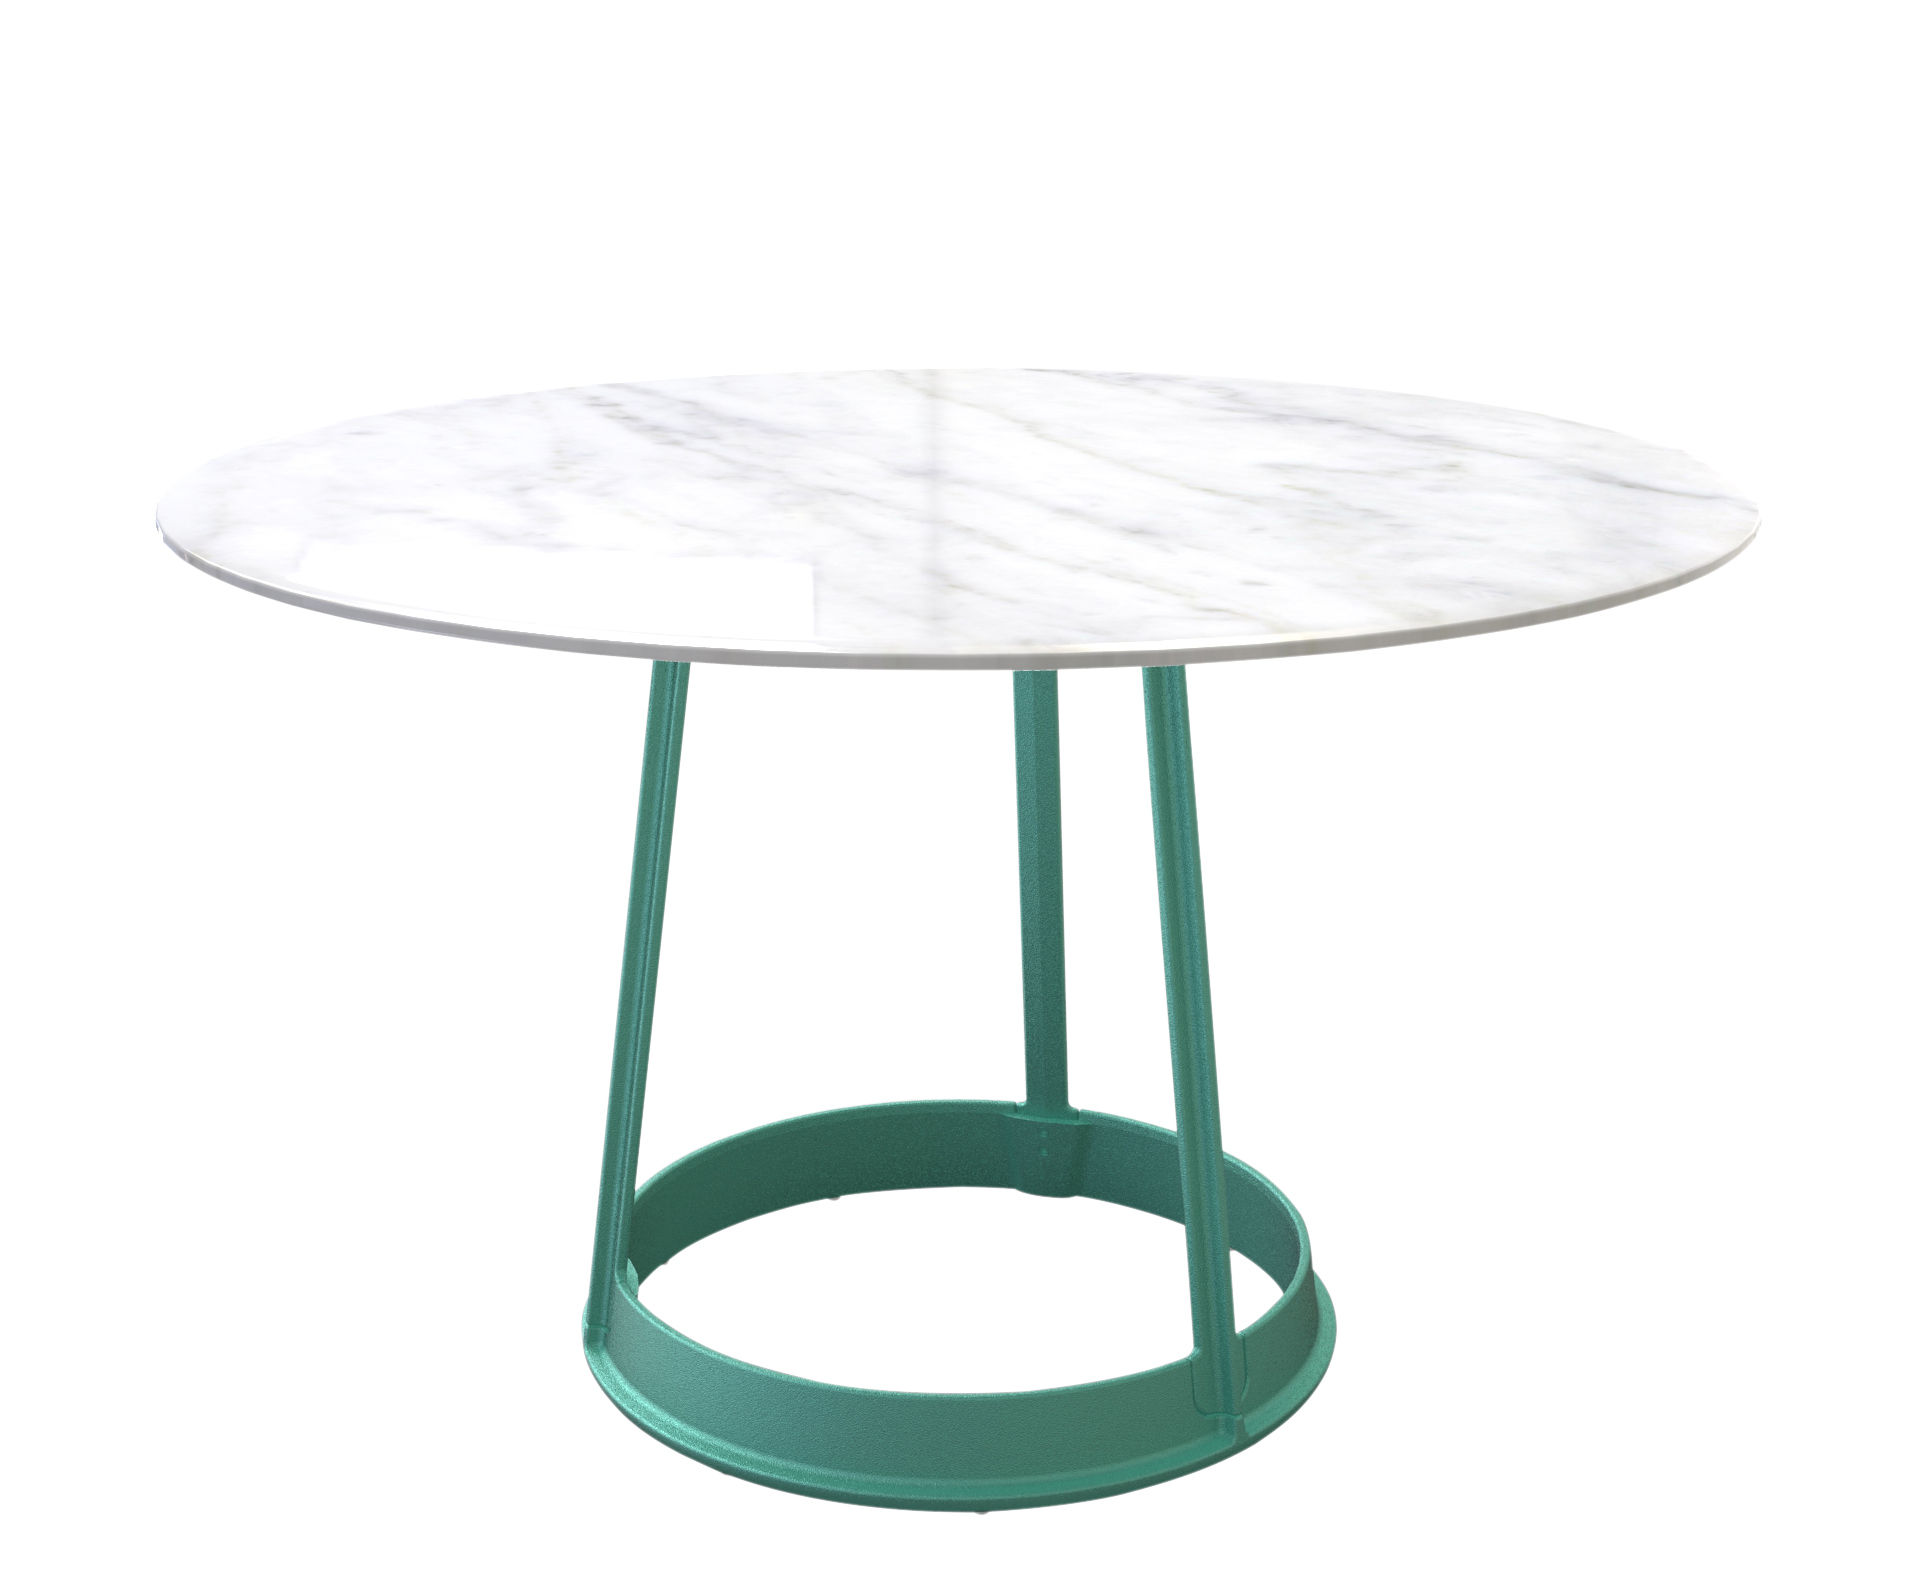 brut tisch marmor gusseisen 130 cm wei er marmor tischgestell gr n by magis made. Black Bedroom Furniture Sets. Home Design Ideas